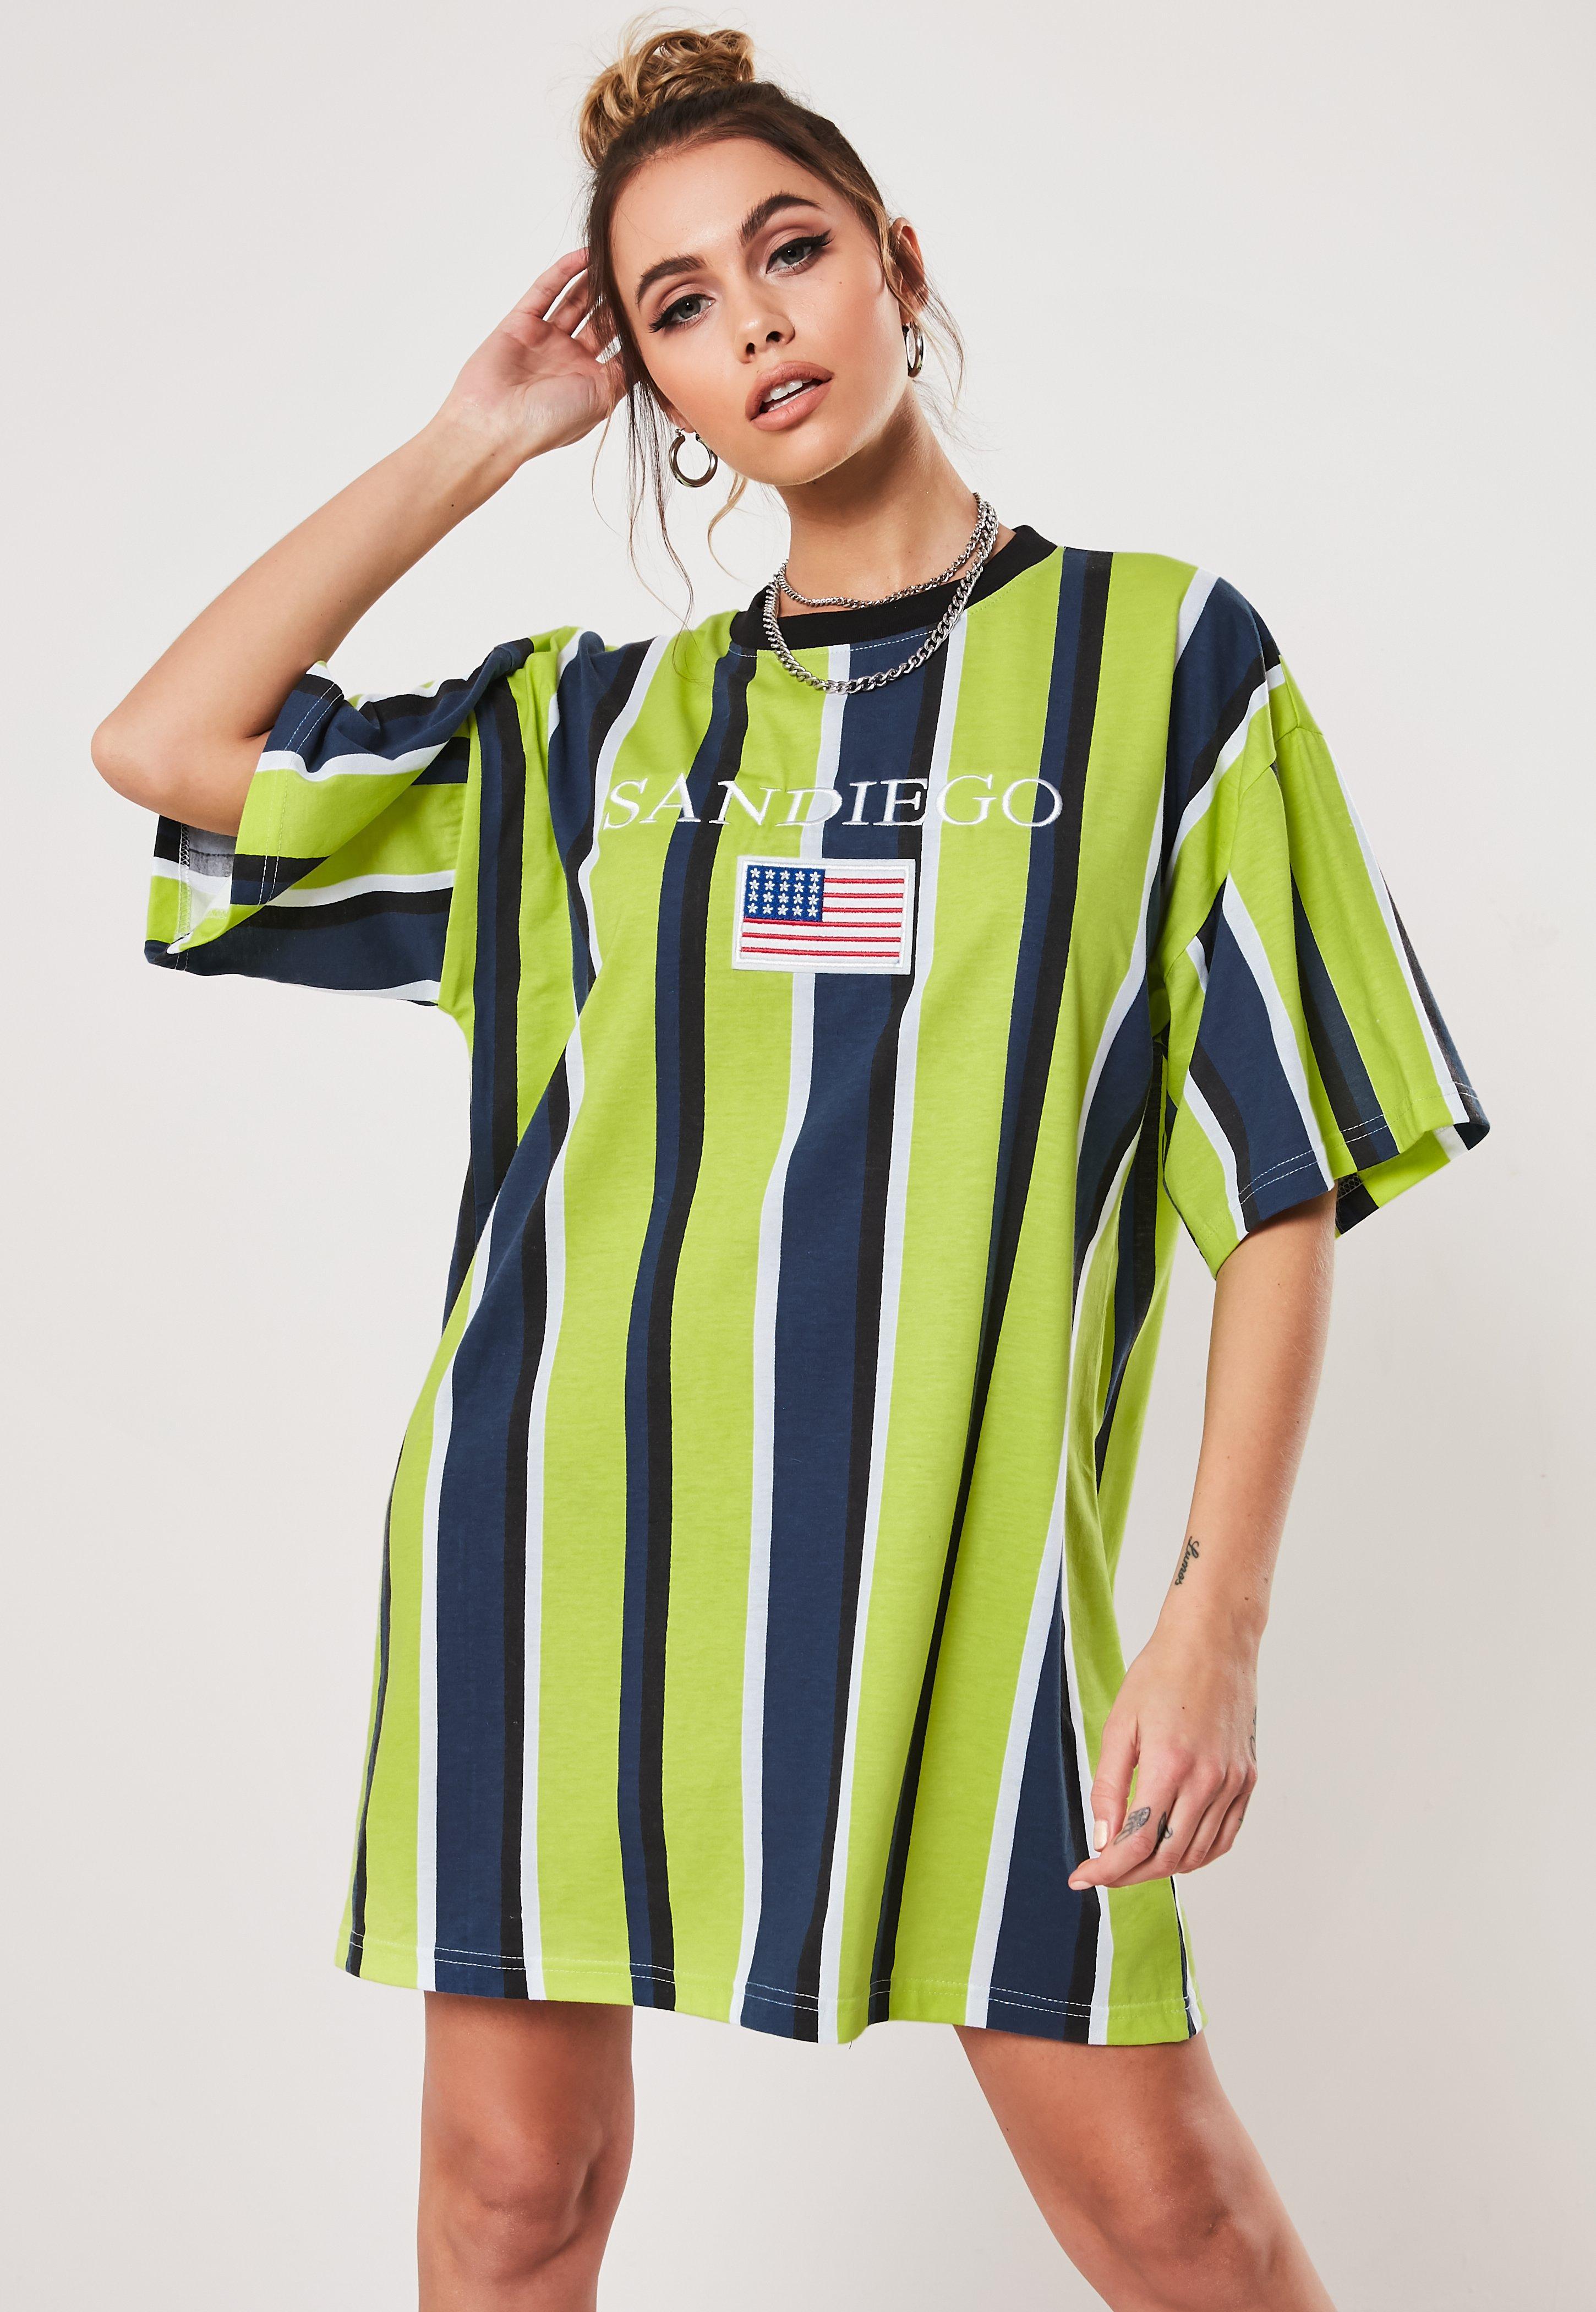 77eaf3cc51e7 T Shirt Dresses | Printed & Slogan T-Shirt Dresses - Missguided